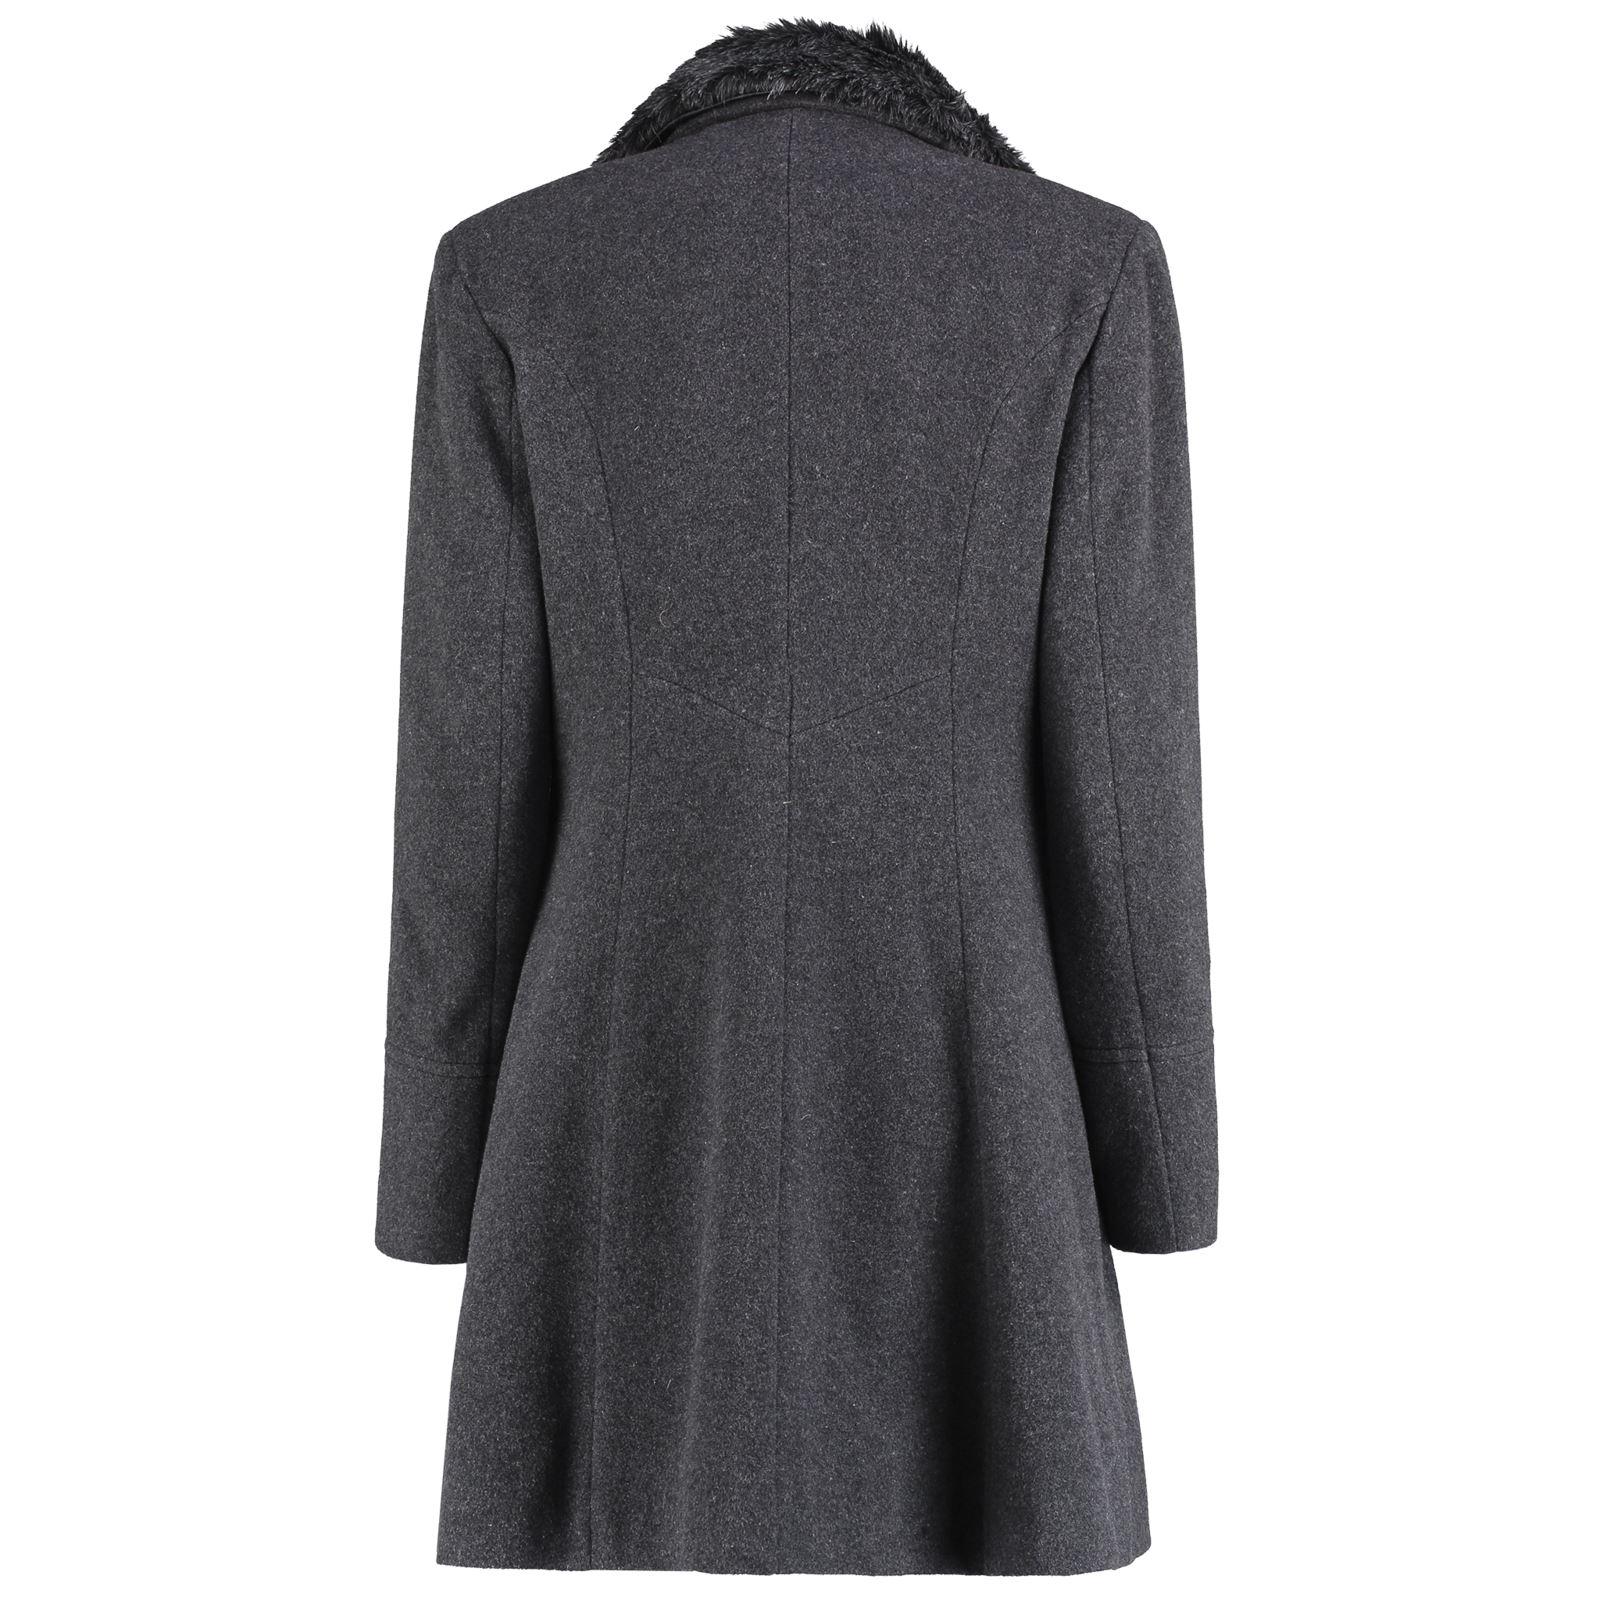 De-La-Creme-Womens-Wool-Blend-Faux-Fur-Collar-Midi-Coat thumbnail 16